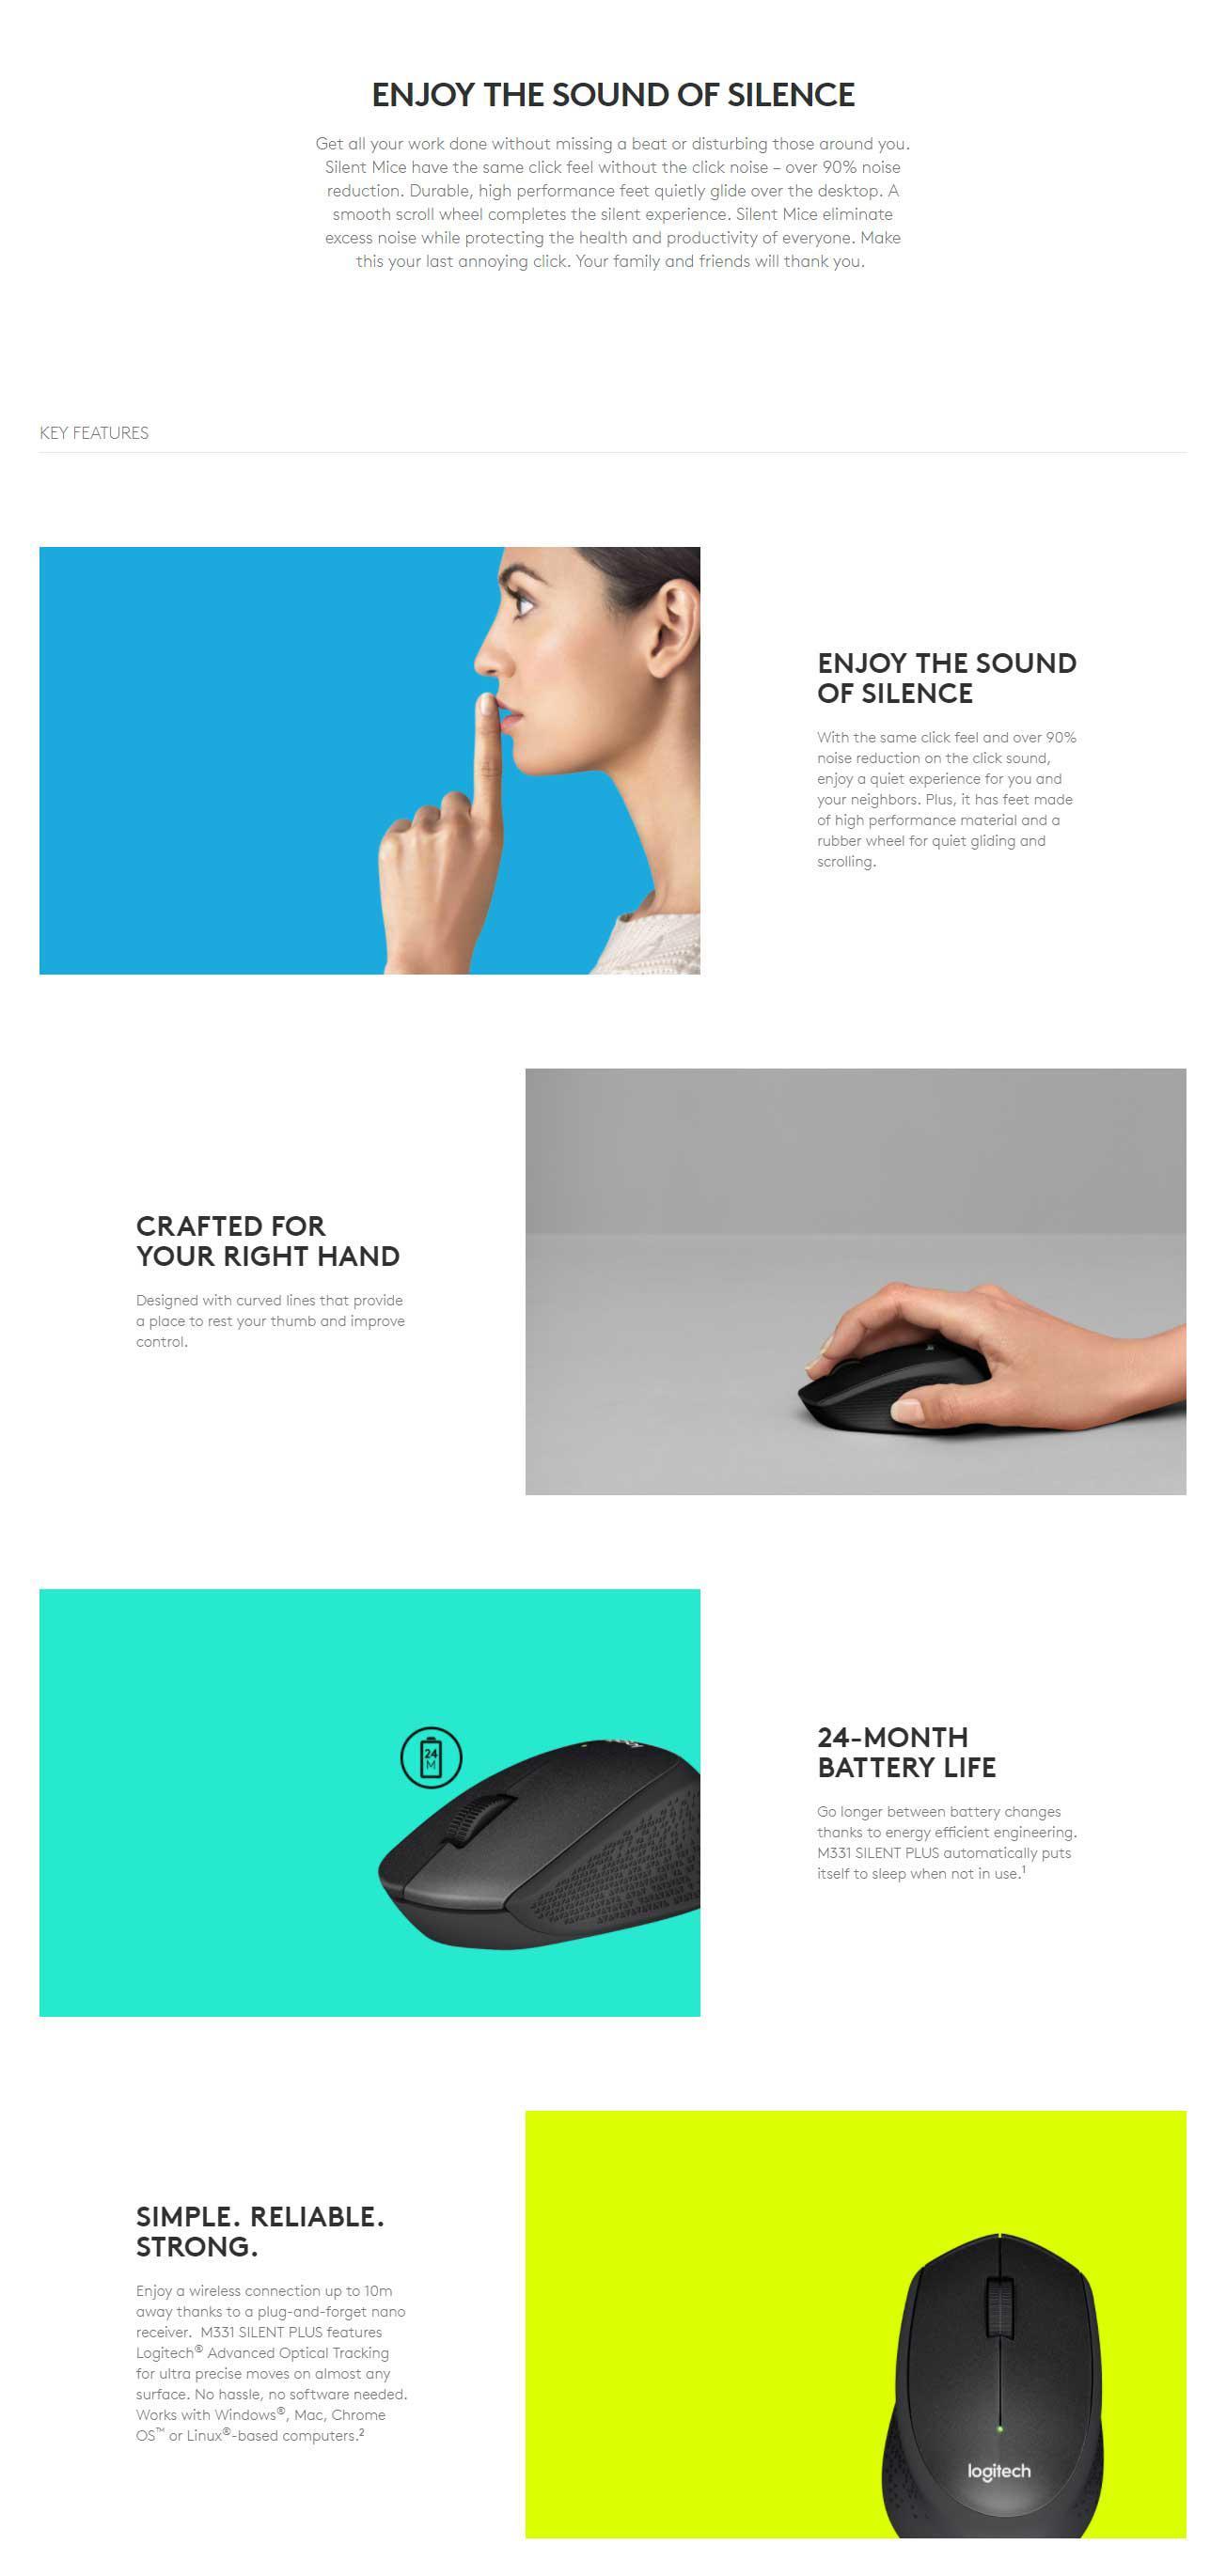 Logitech Wireless Mouse M331 Silent Plus Original Black Referensi Garansi Resmi Specifications Of